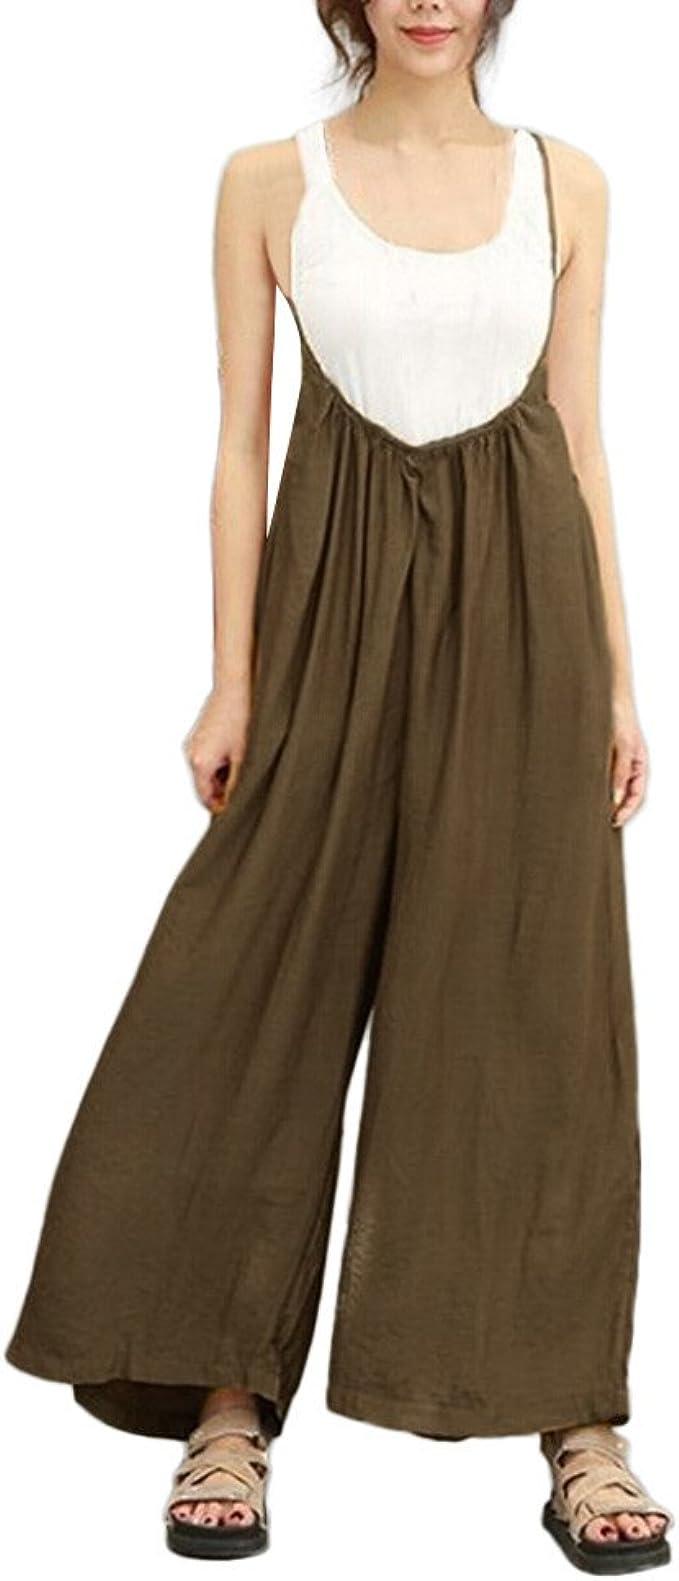 Tuta lunga donna Tuta Salopette Pantaloni senza maniche larghe Jumpsuit Playsuit